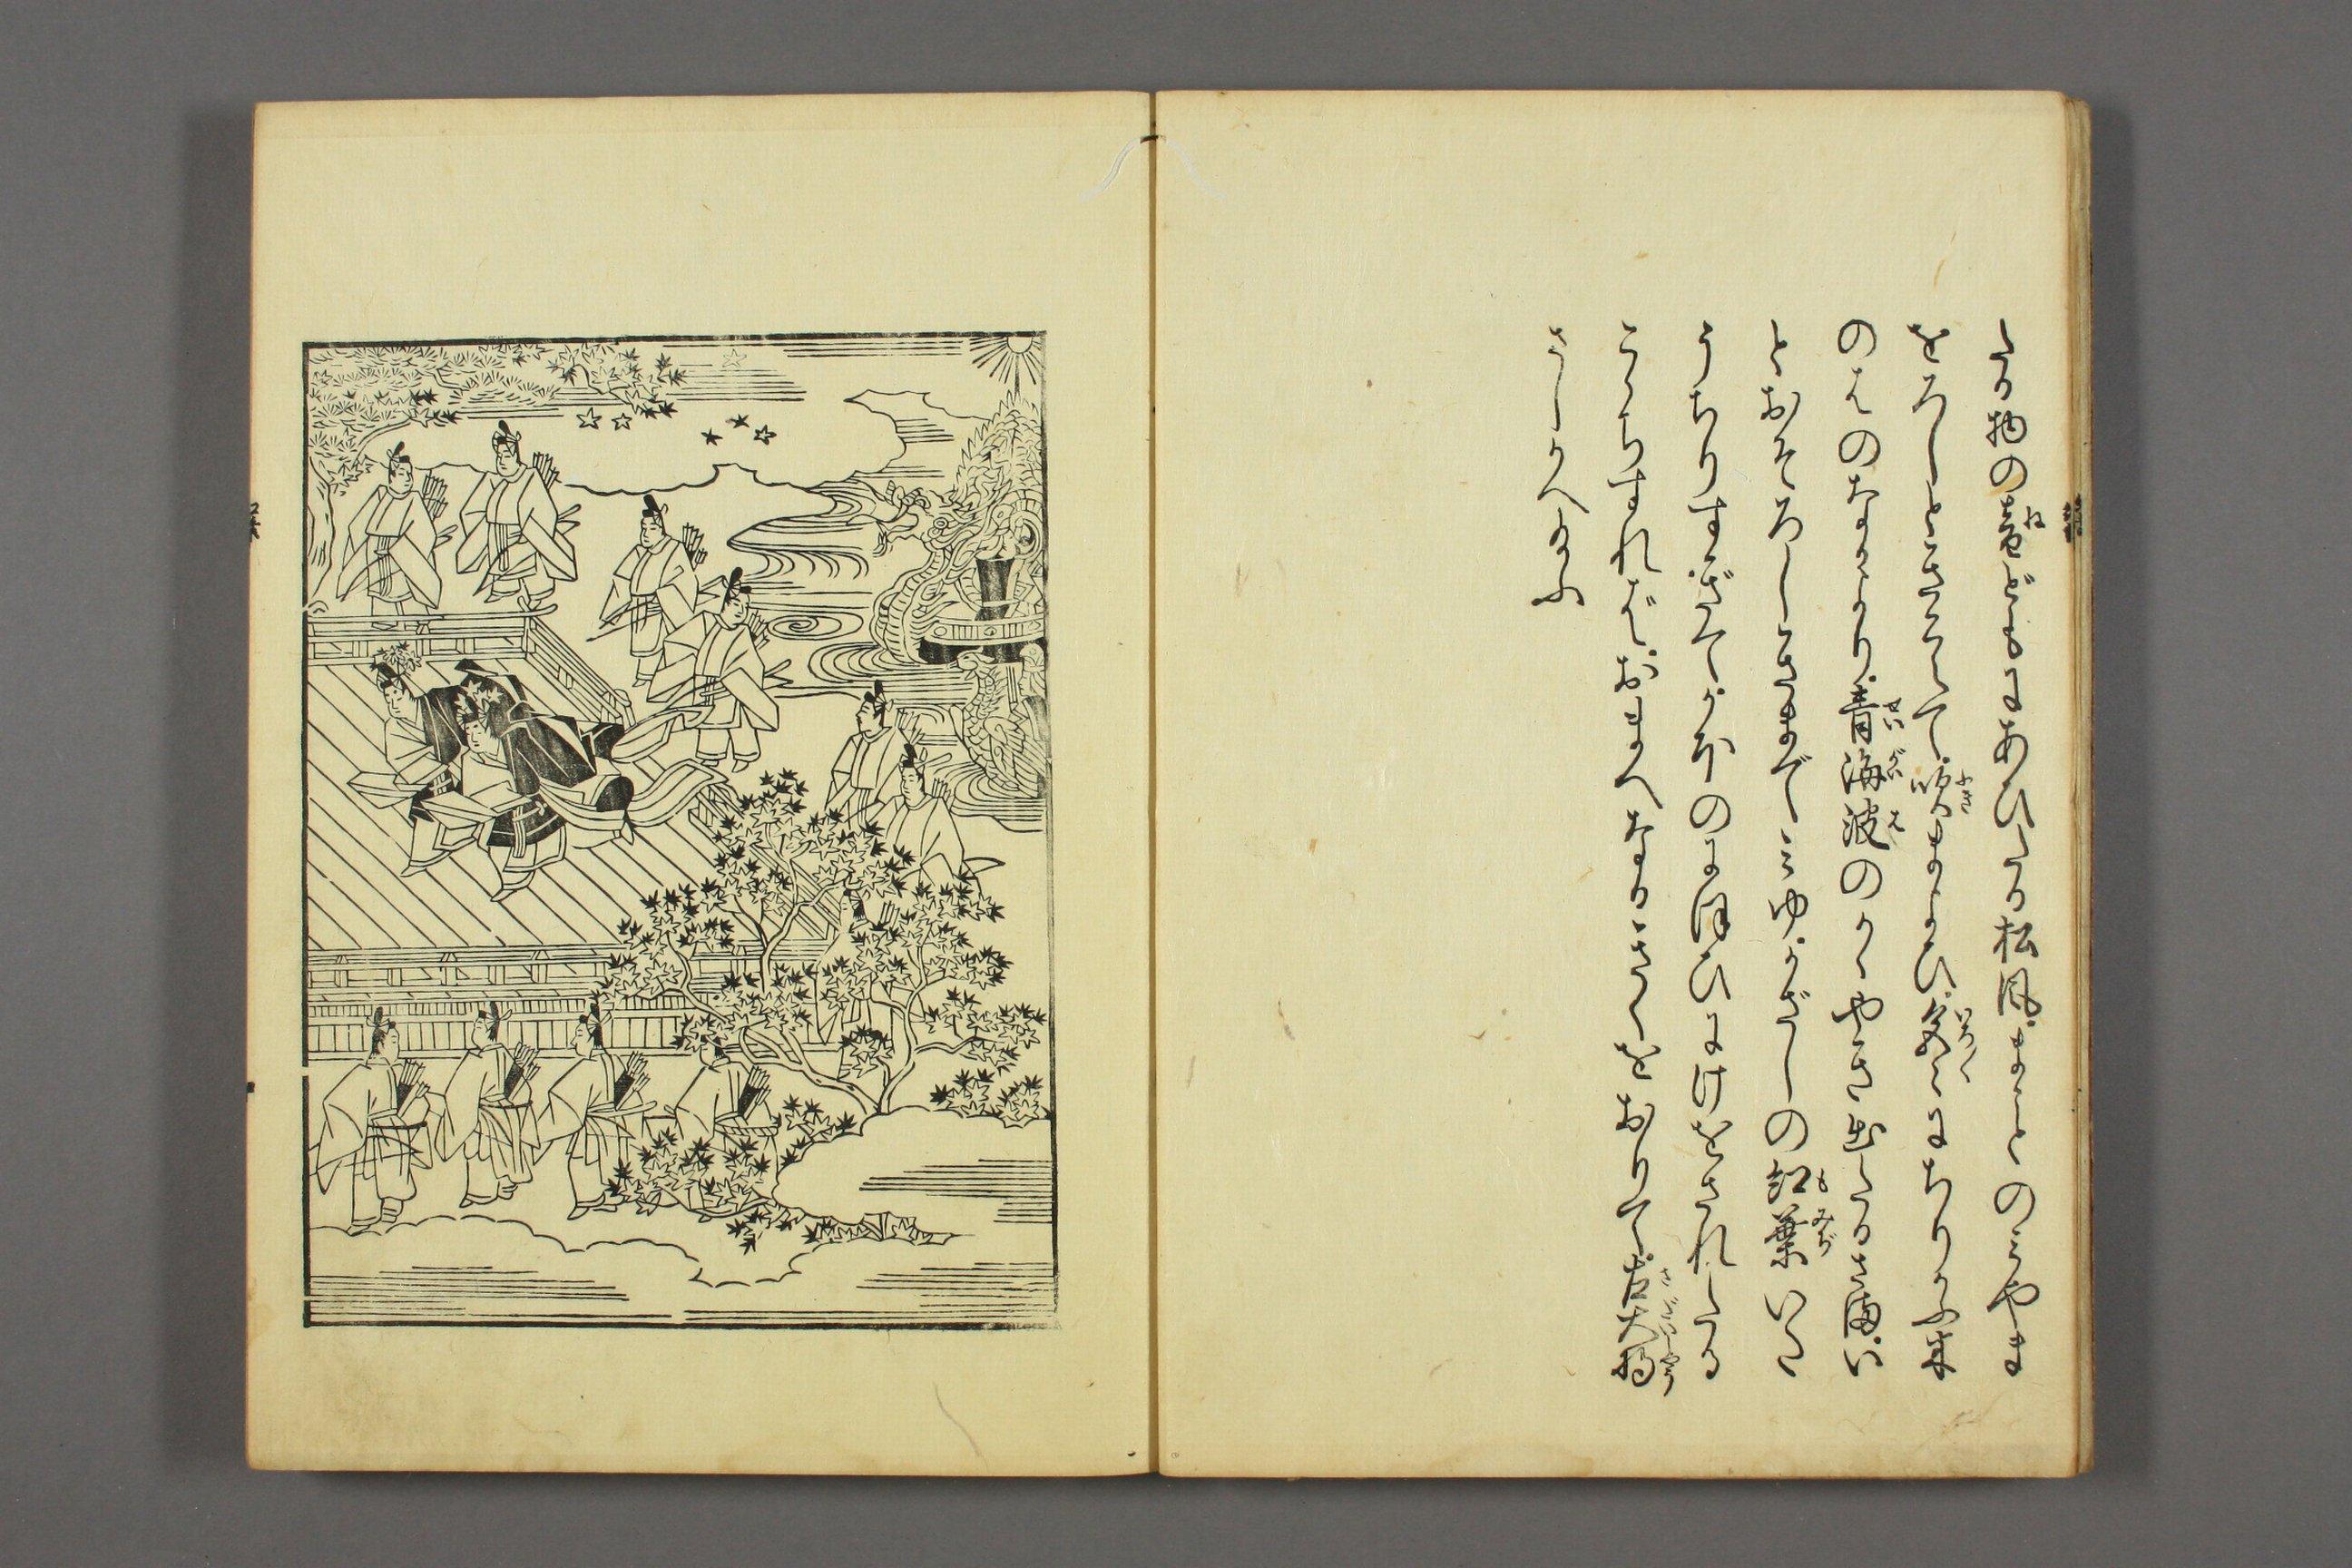 http://archive.wul.waseda.ac.jp/kosho/bunko30/bunko30_a0007/bunko30_a0007_0007/bunko30_a0007_0007_p0005.jpg